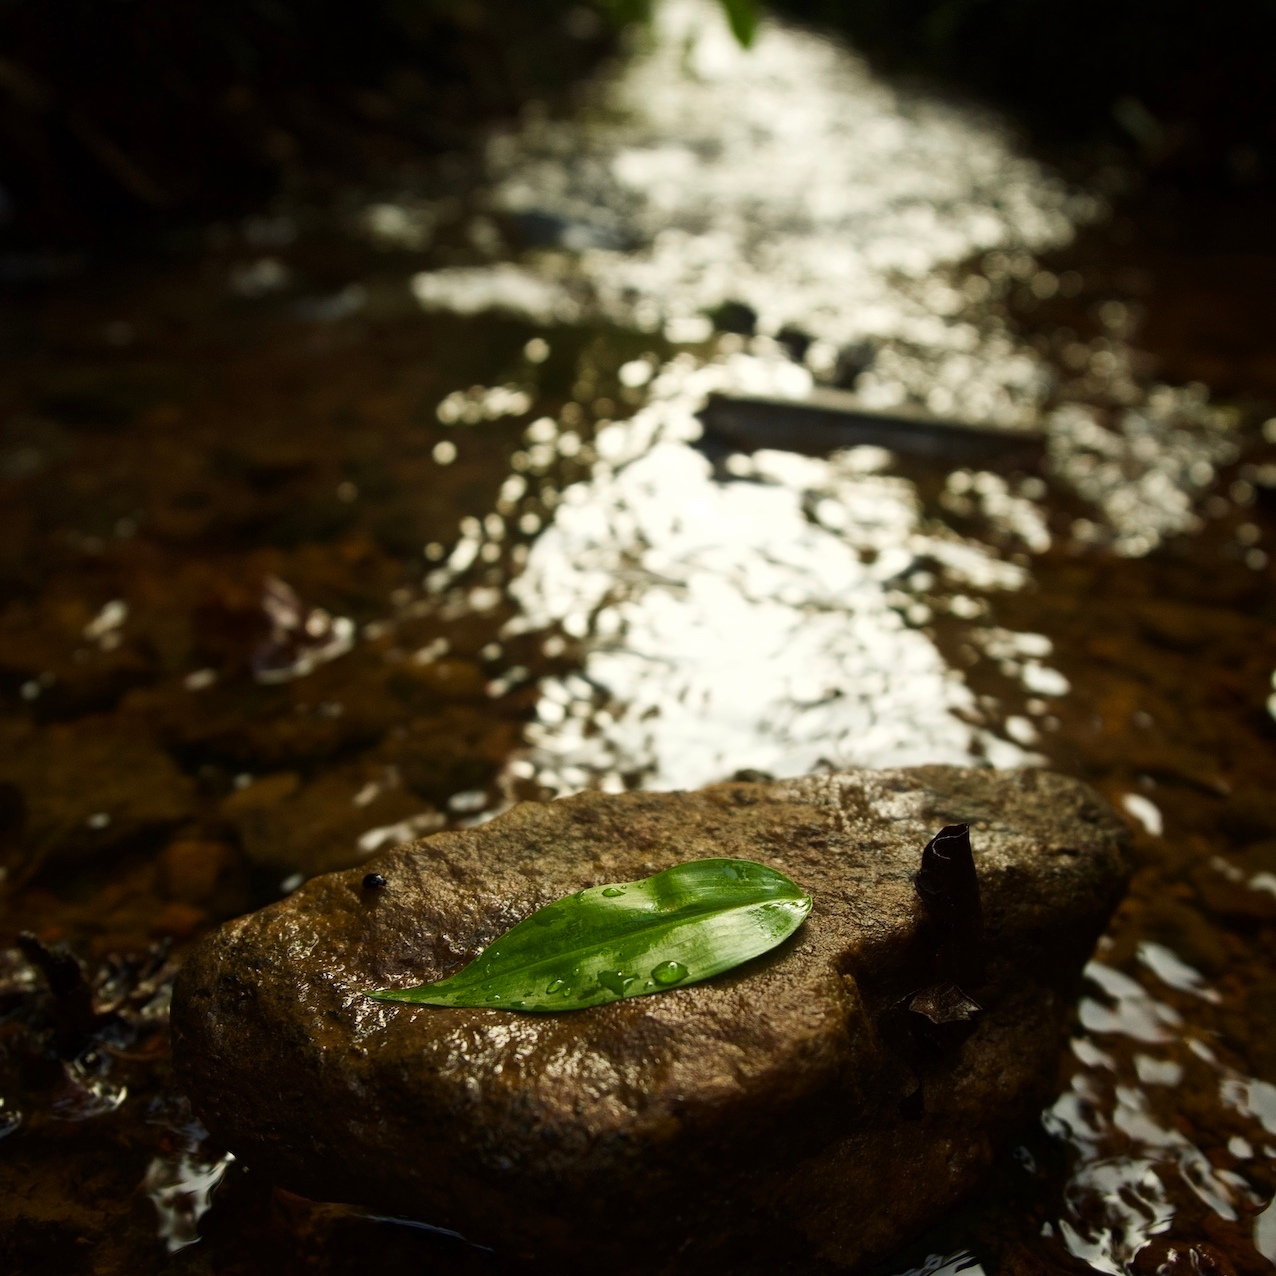 Leaf on a rock in a Stream